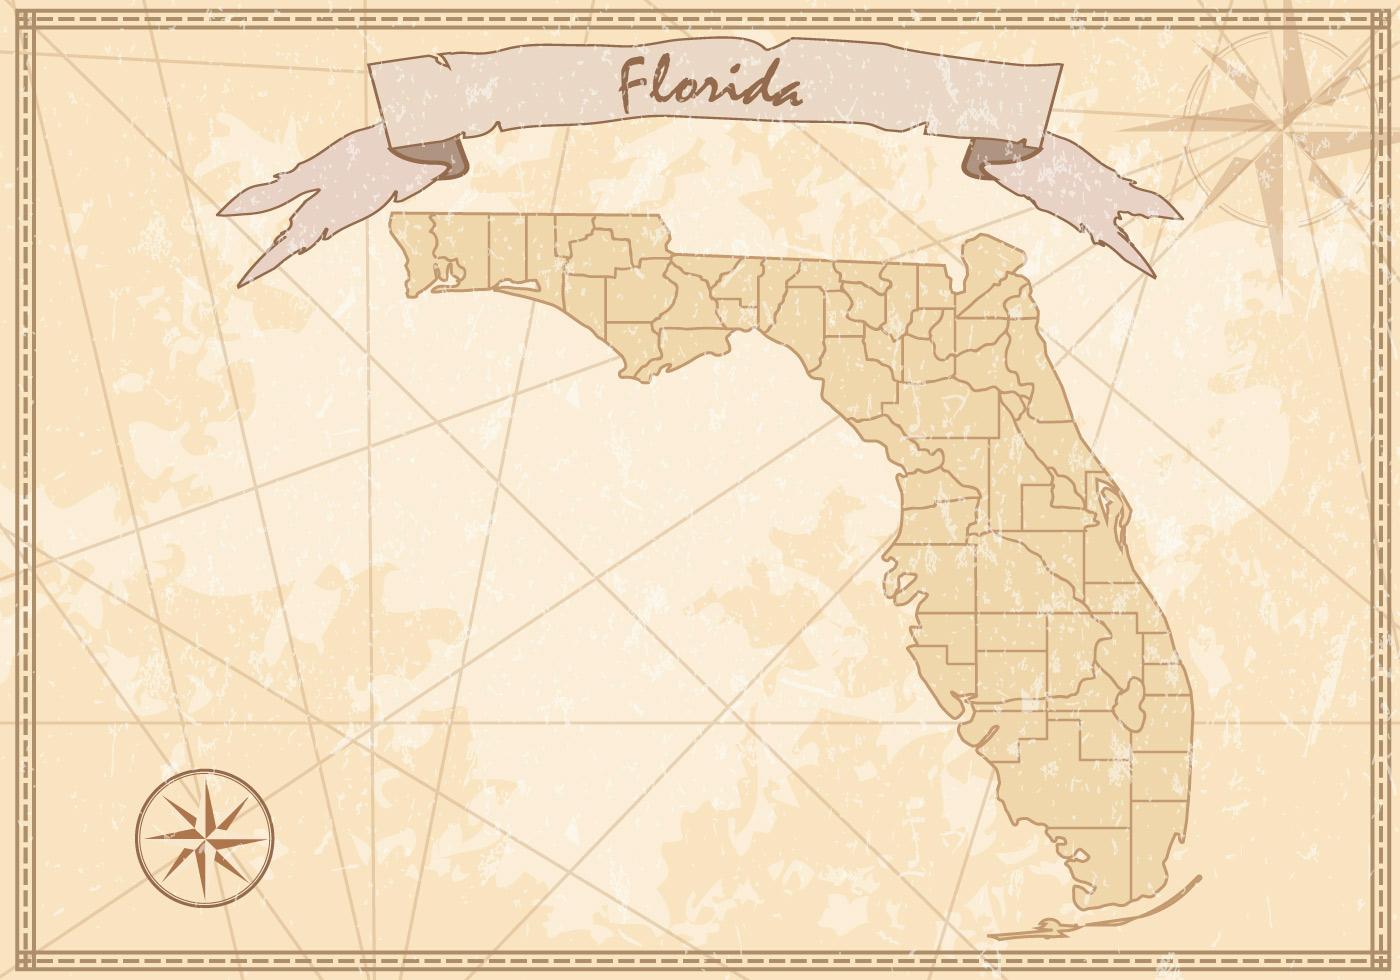 Vintage Florida Map - Download Free Vectors, Clipart ...